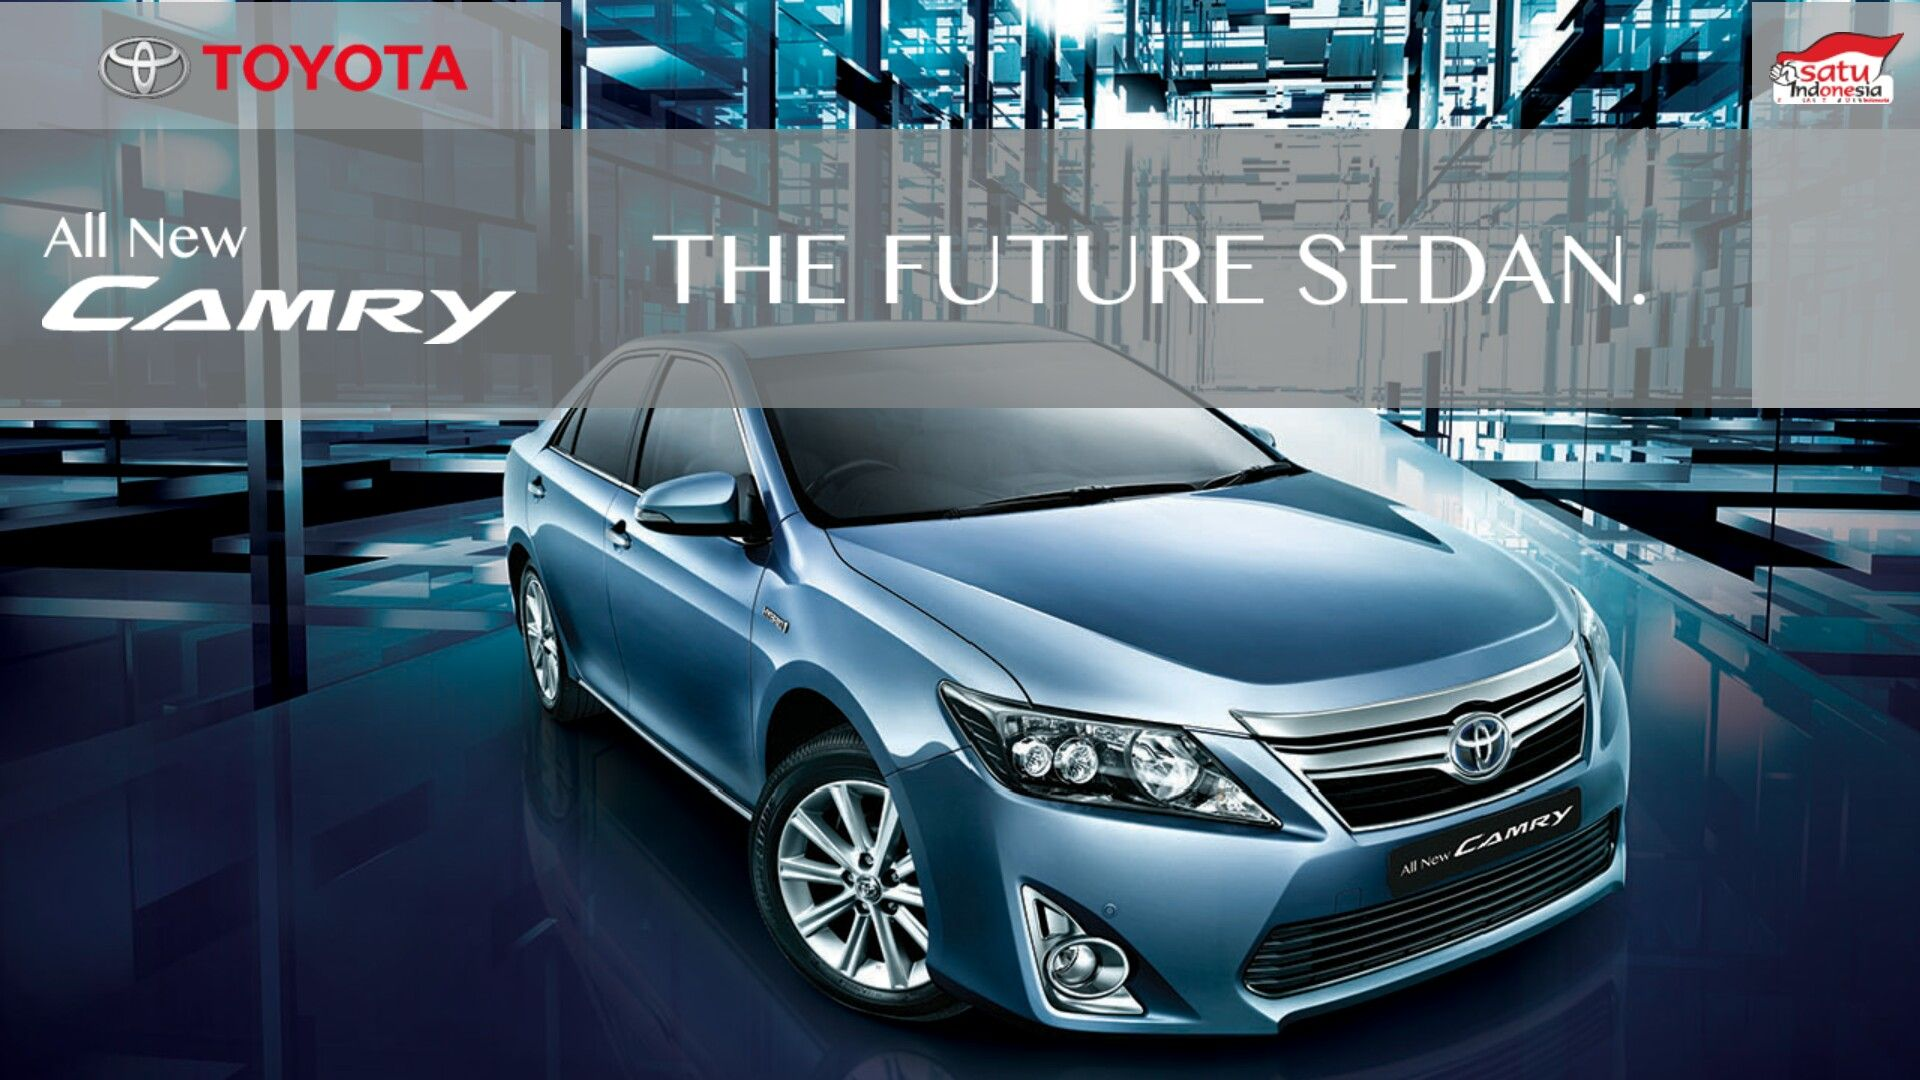 New Toyota Camry Harga Cash Mulai Dari Rp 595 000 000 Cicilan Kredit Rp 8 352 000 Bulan Toyota Camry Toyota Mobil Baru